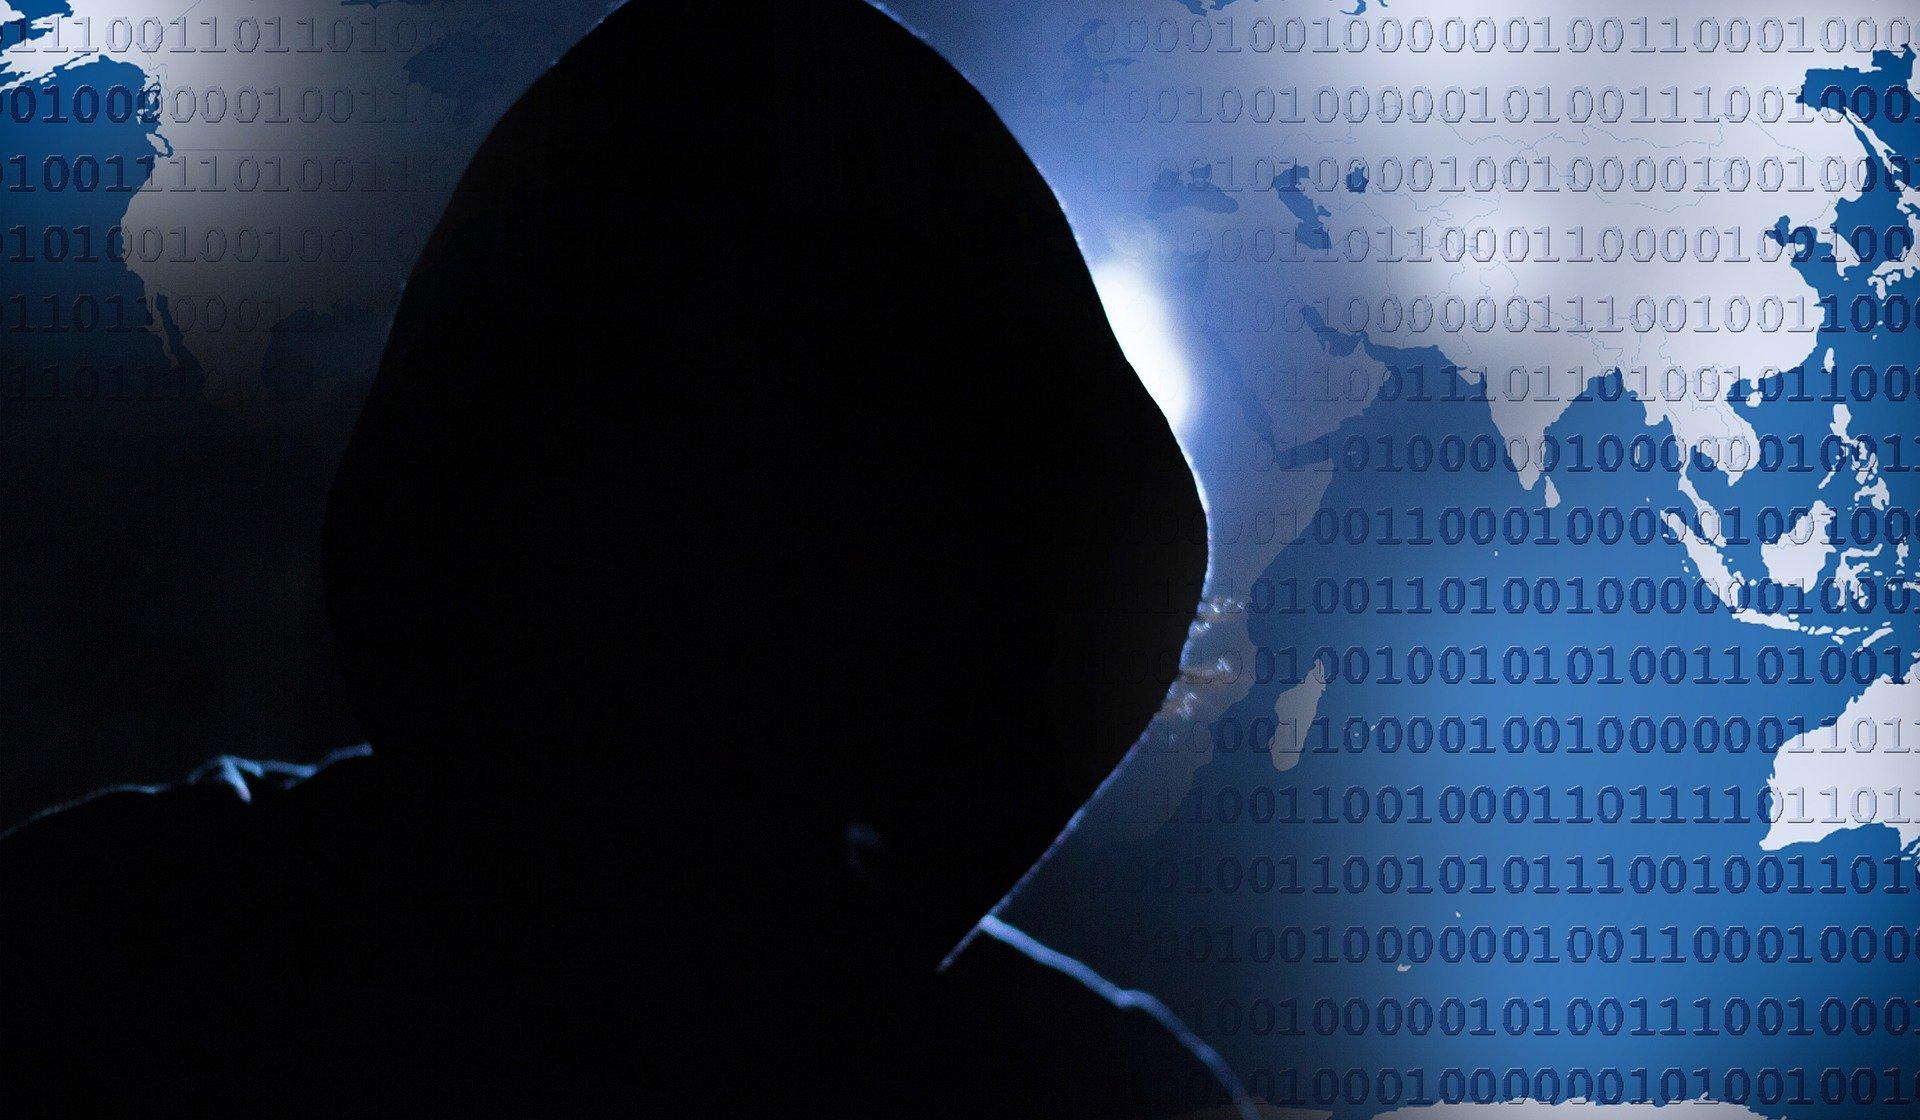 Apple Scam Calls 2020 - Suspicious Activities in iCloud Account